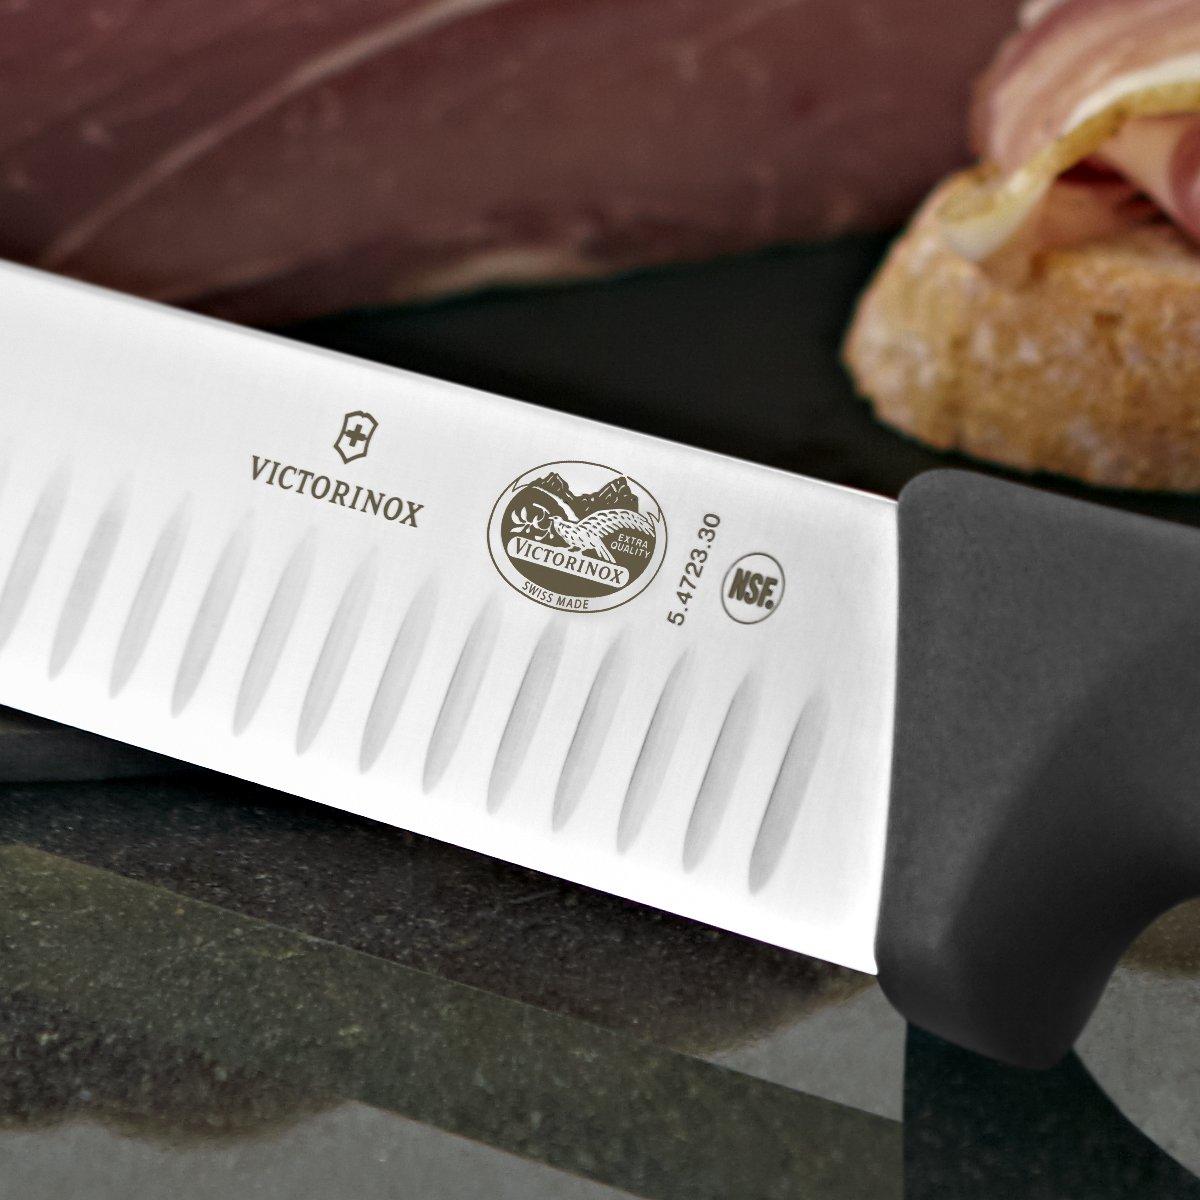 Victorinox 12 Inch Fibrox Pro Slicing Knife with Granton Blade by Victorinox (Image #5)